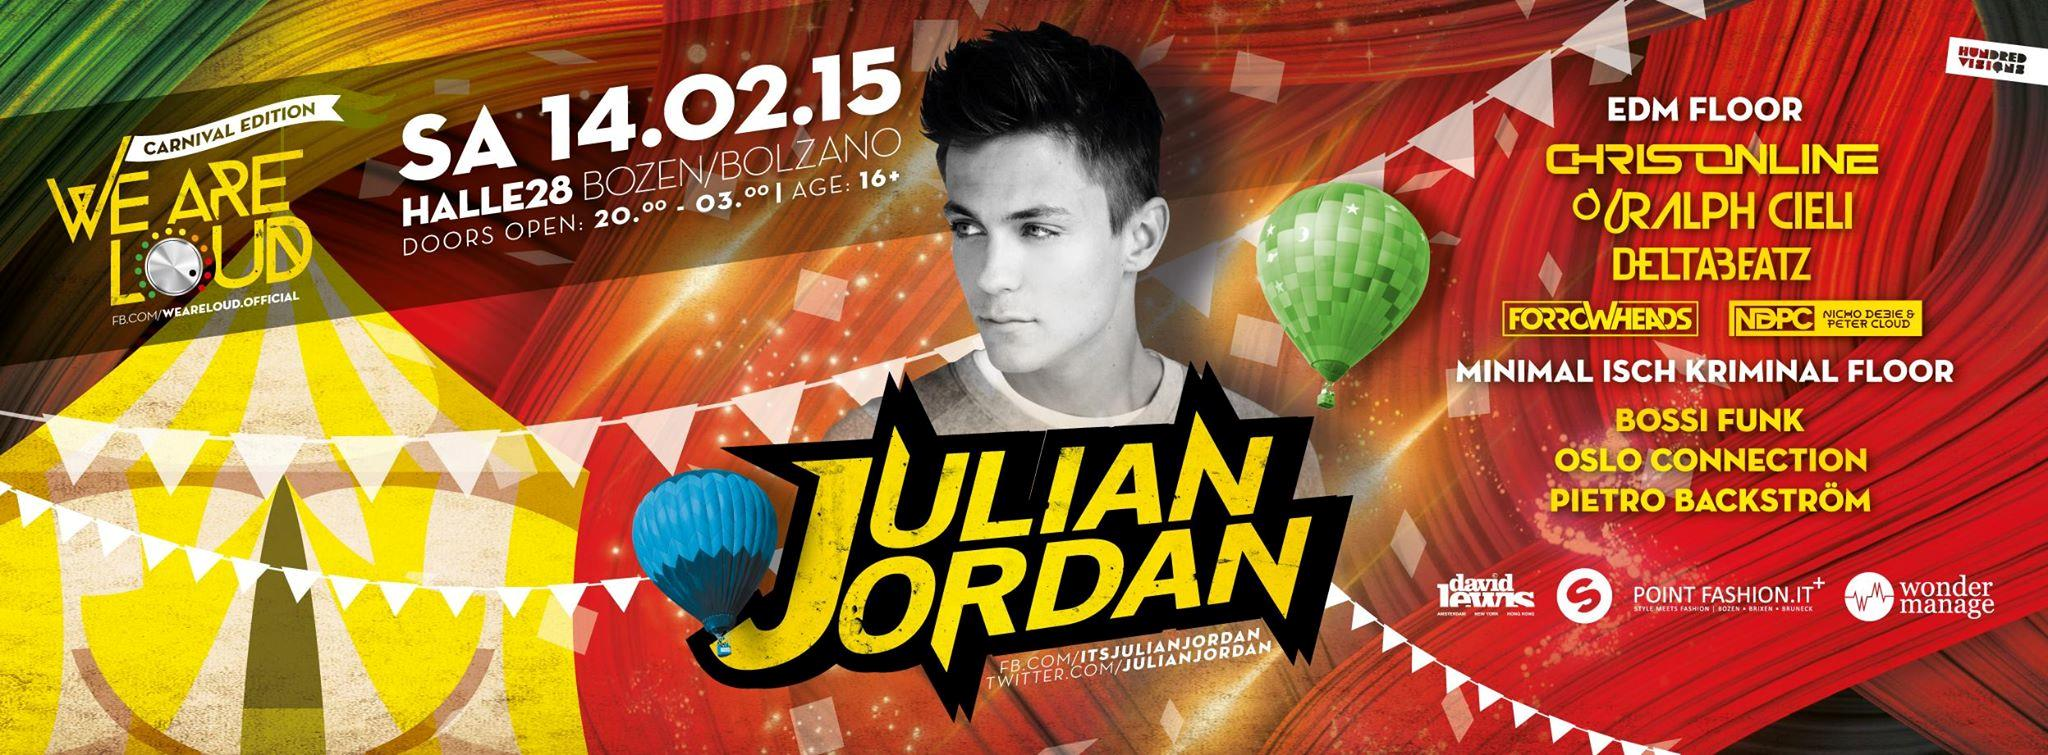 Julian Jordan arriva in Italia